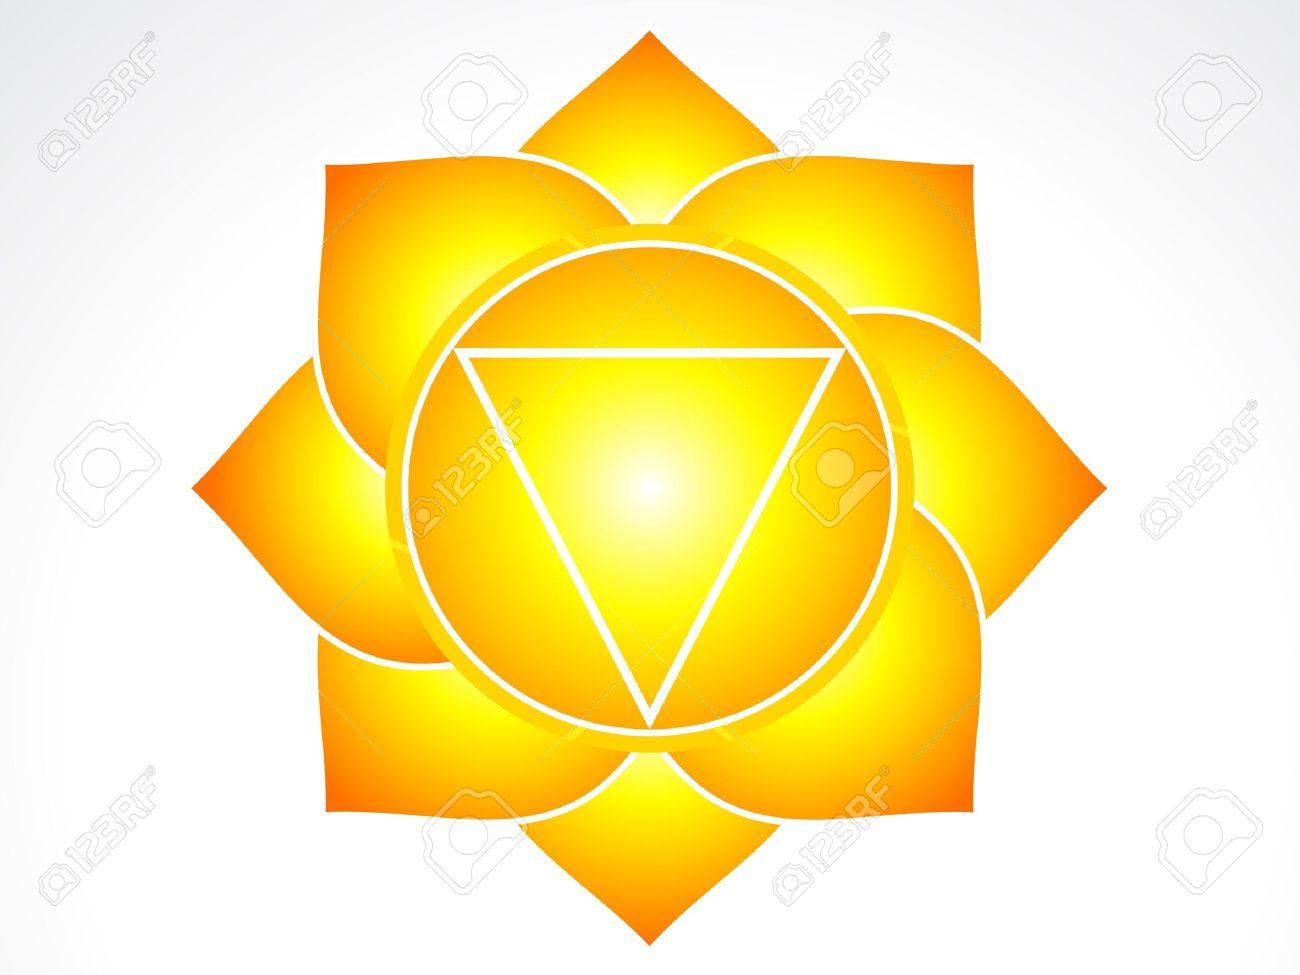 solar plexus chakra  illustration Stock Vector - 16477780